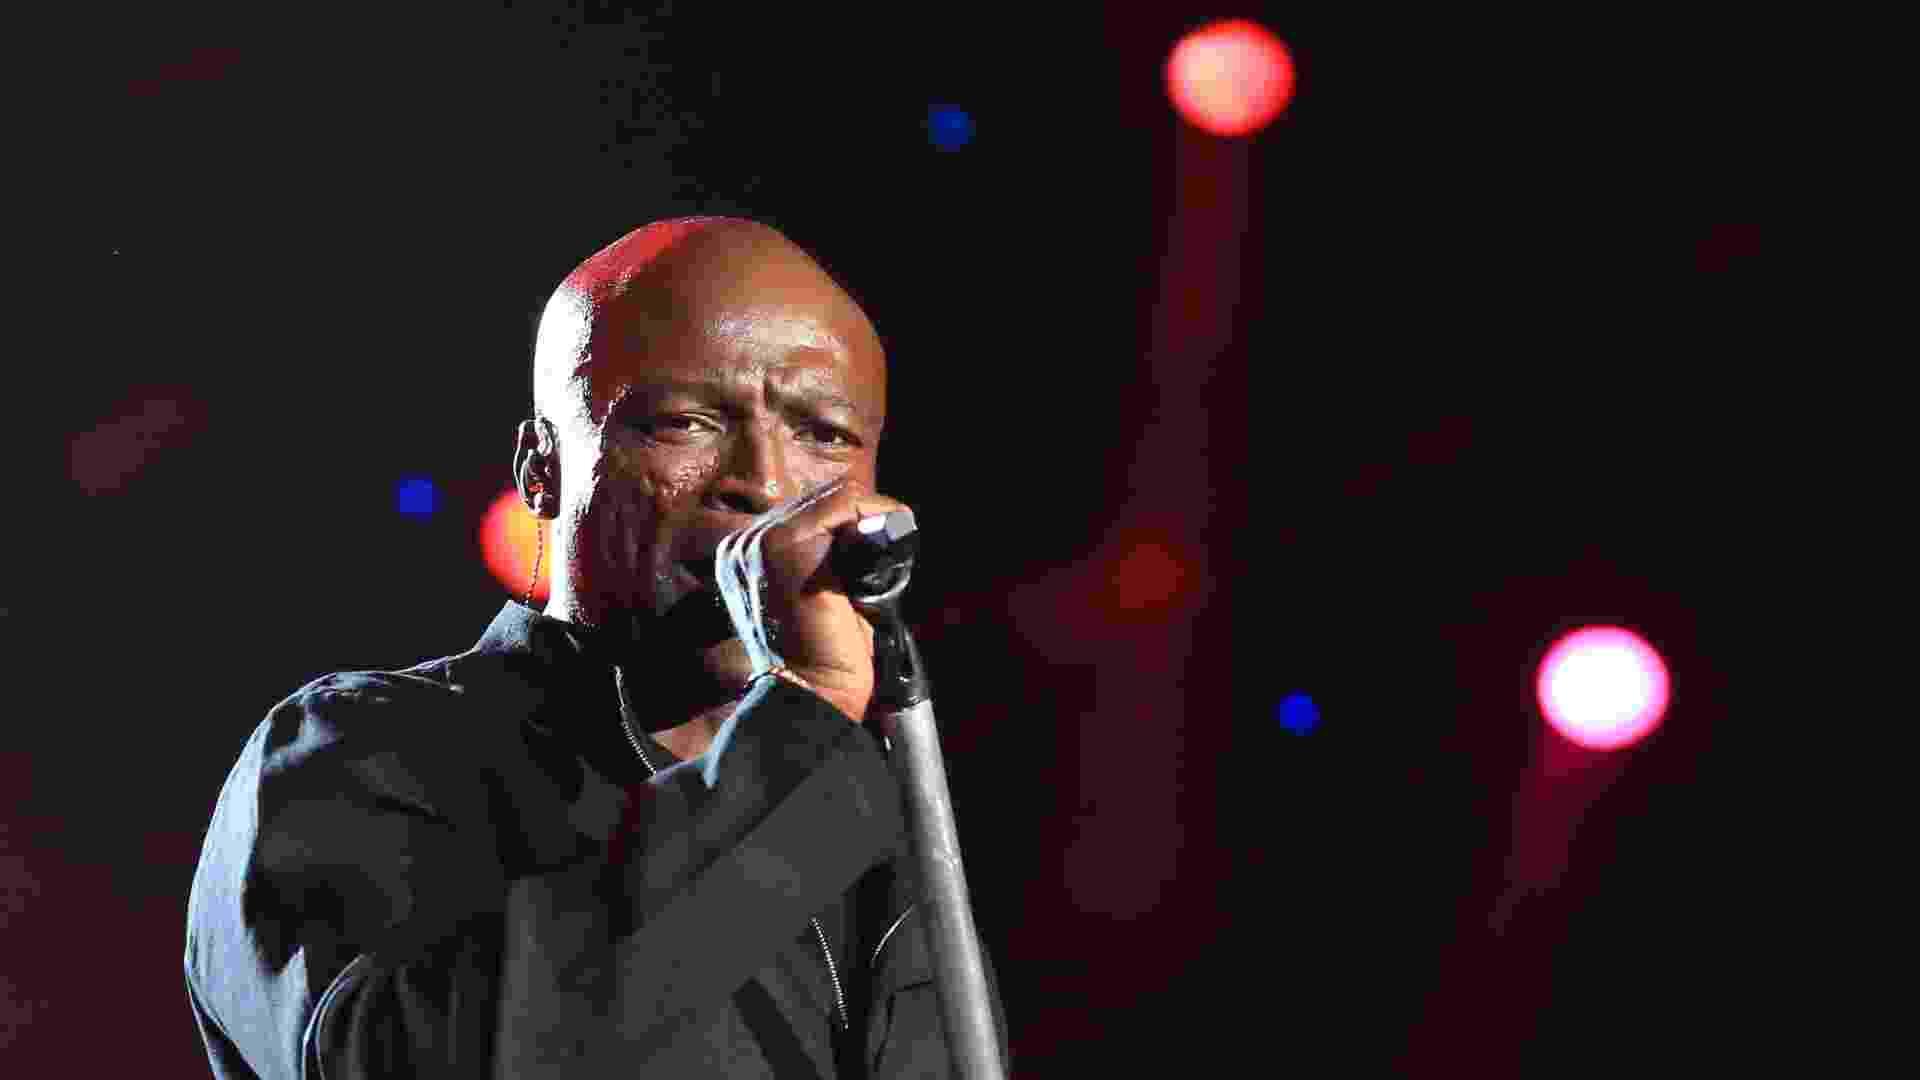 20.set.2015 - Seal se apresenta no palco Mundo no terceiro dia do Rock in Rio 2015 - Marco Antonio Teixeira/UOL